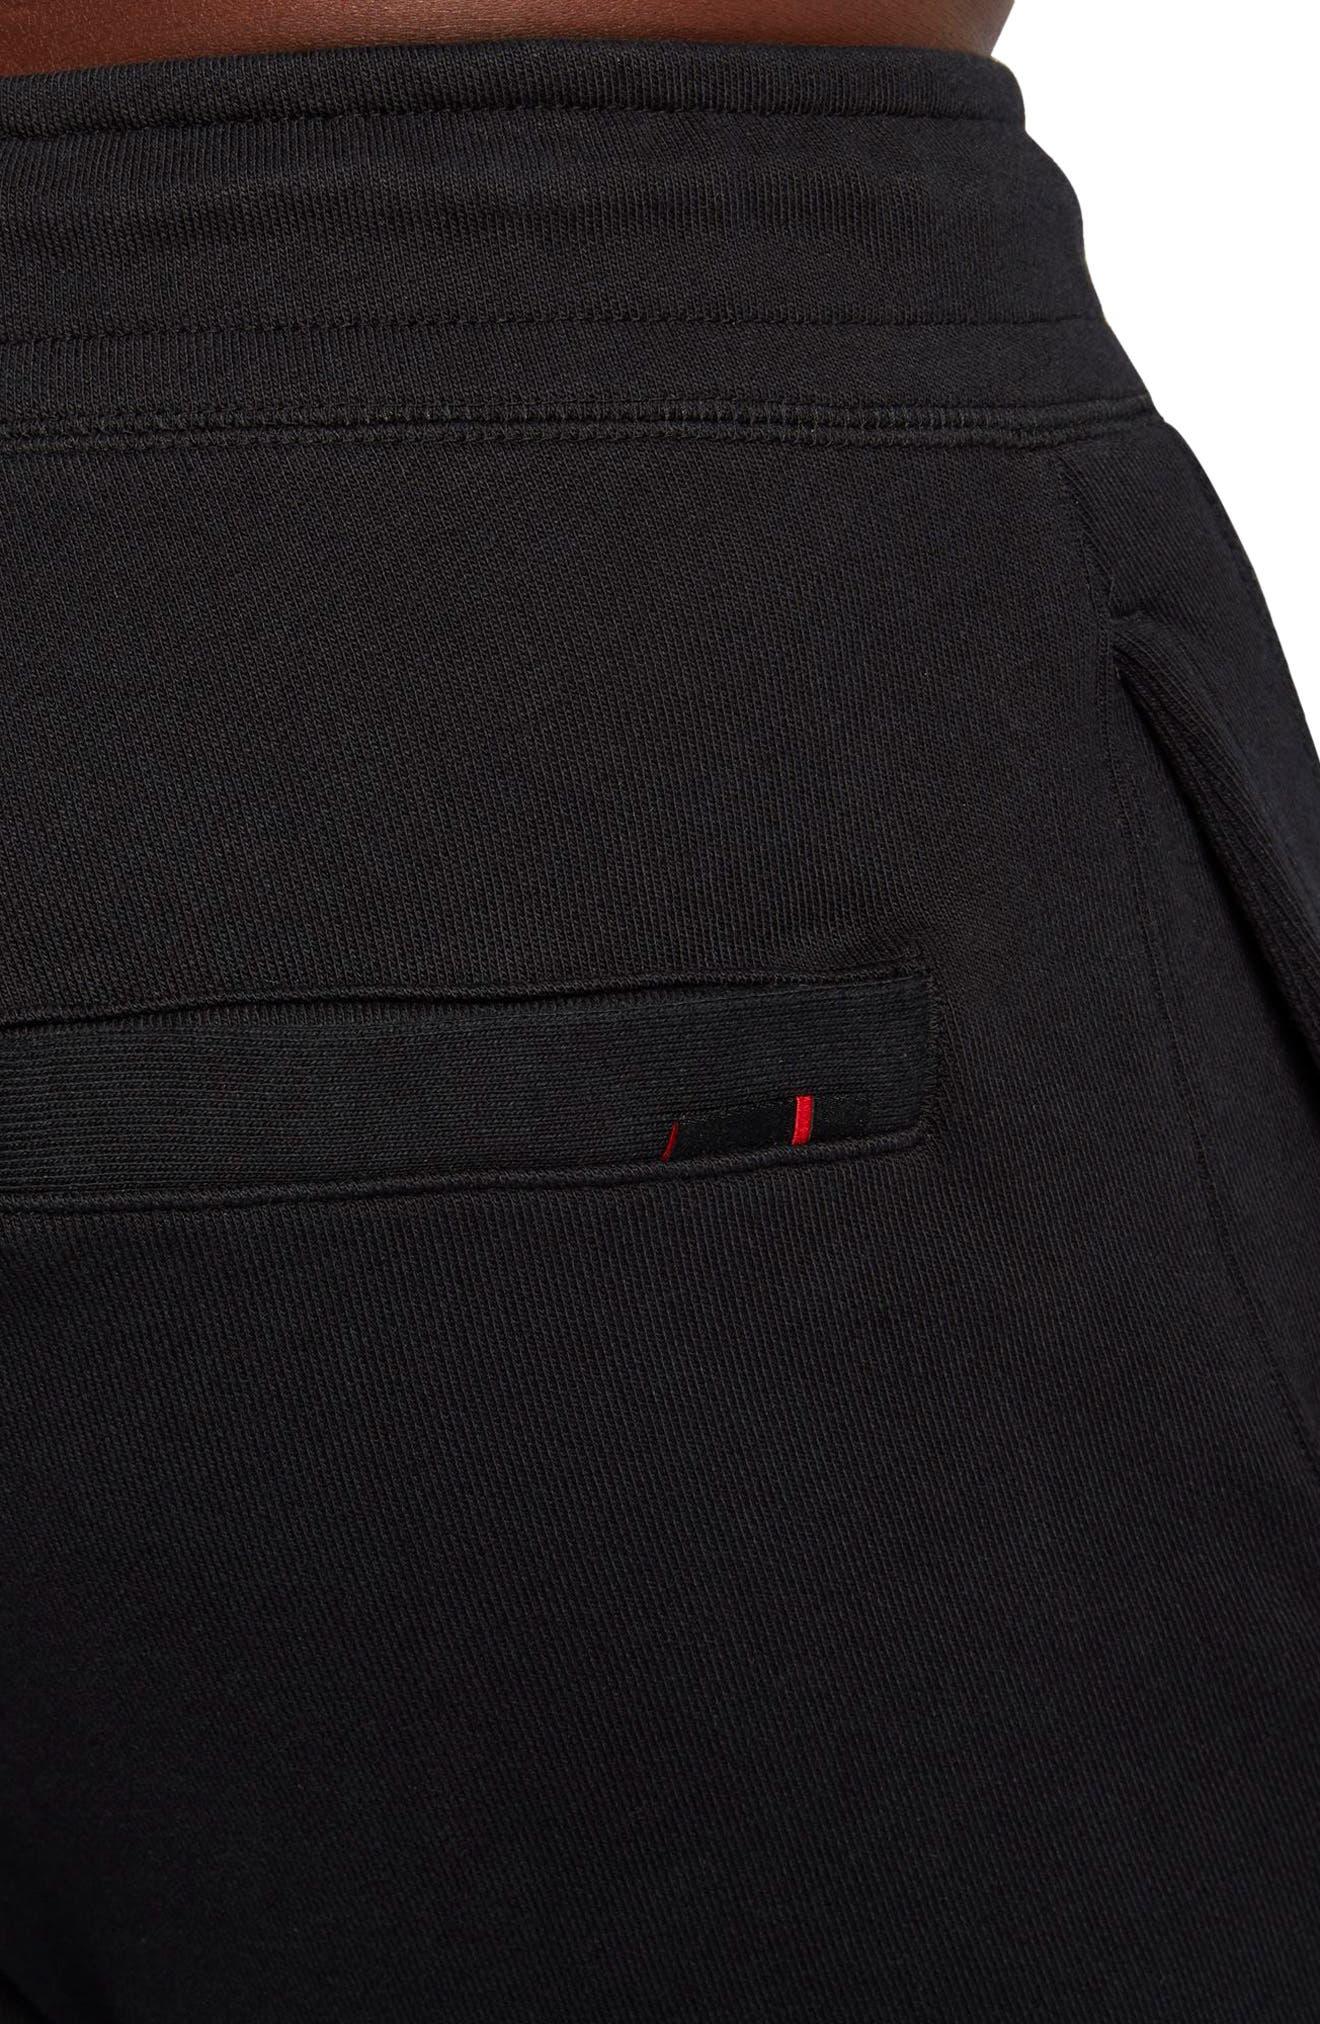 JORDAN, Wings Fleece Pants, Alternate thumbnail 5, color, BLACK/ BLACK